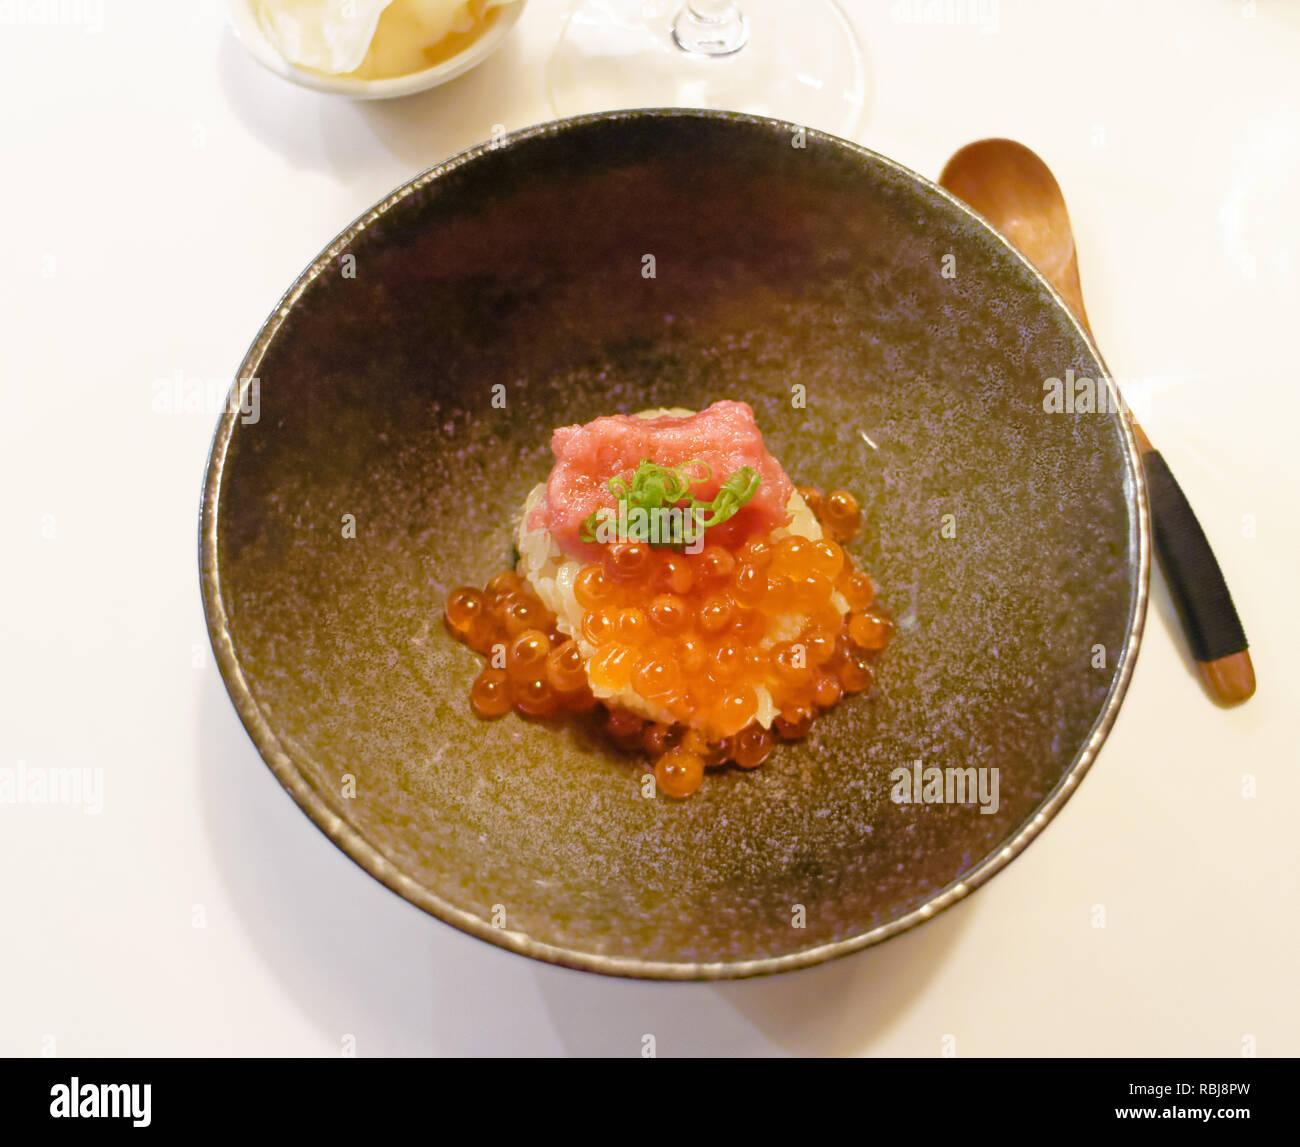 A bowl of fatty tuna and salmon roe sushi in Yasu Omakase Sushi Bar in Toronto, Canada - Stock Image